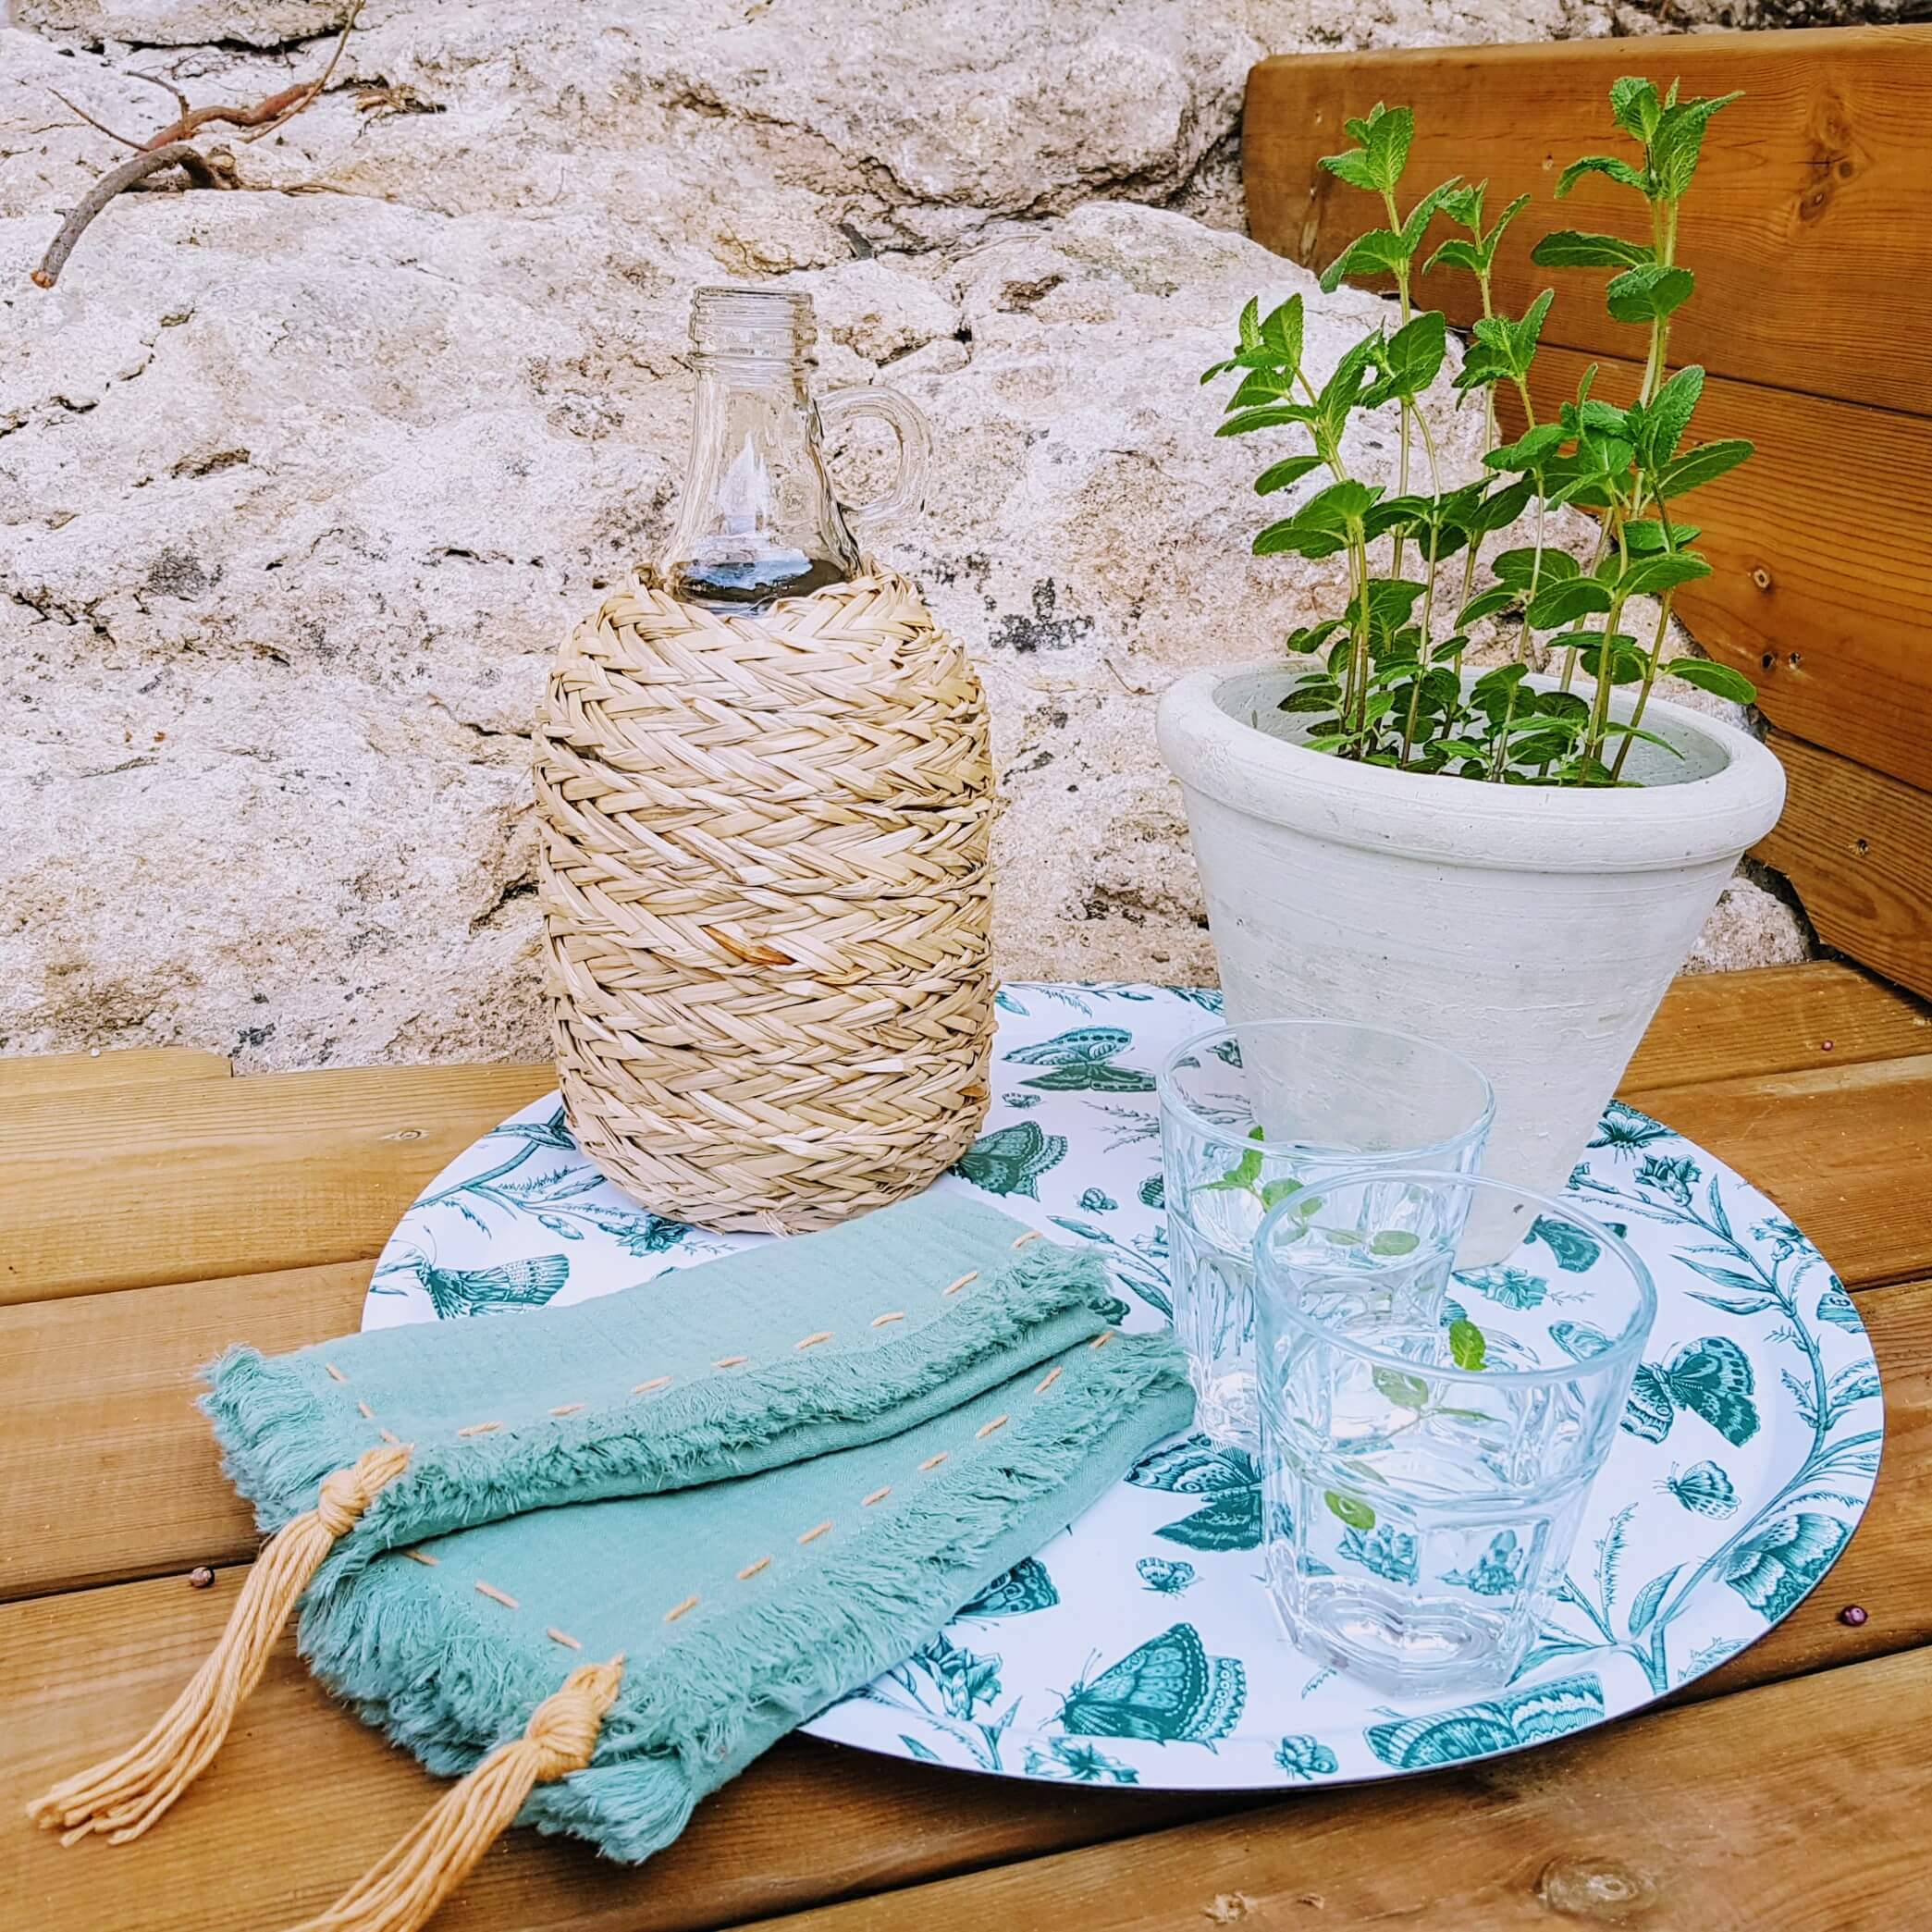 linibini - napkins with pompoms